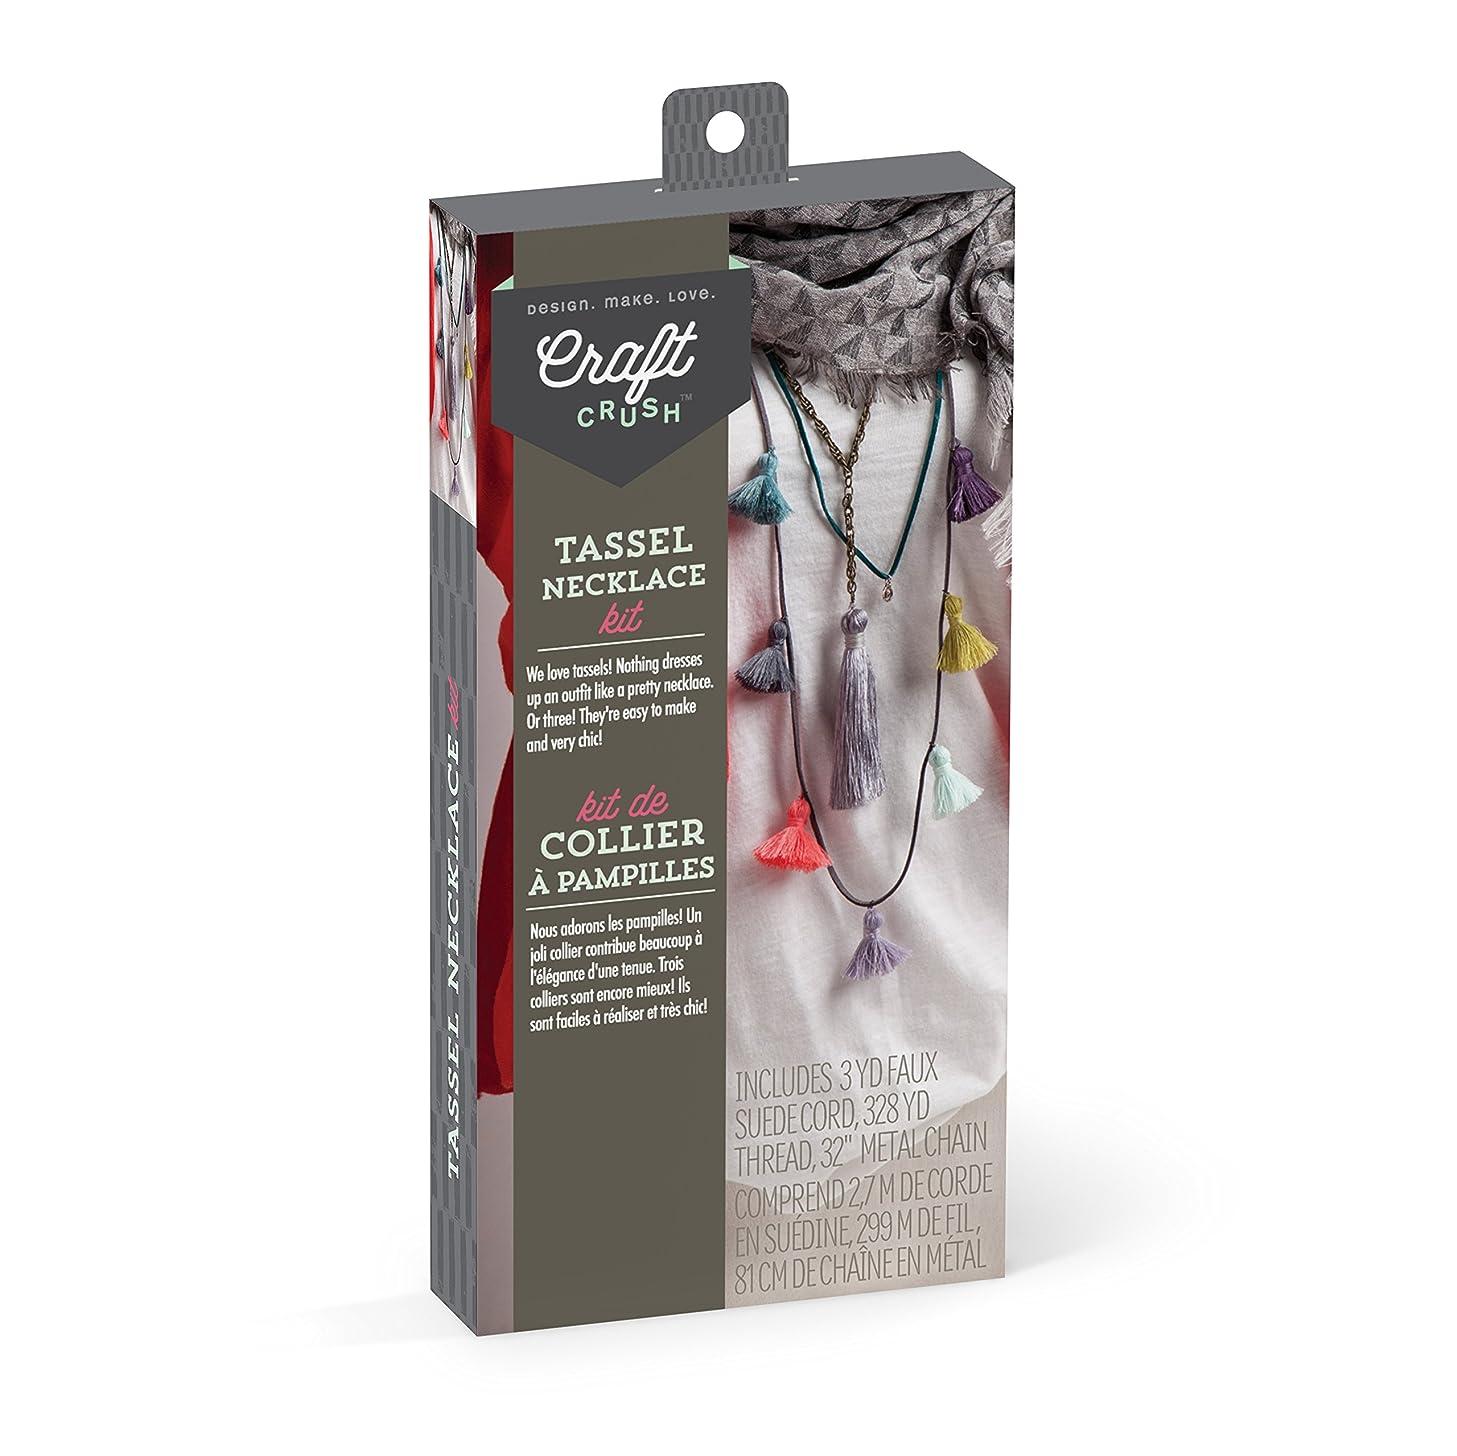 Craft Crush Tassel Necklace Kit